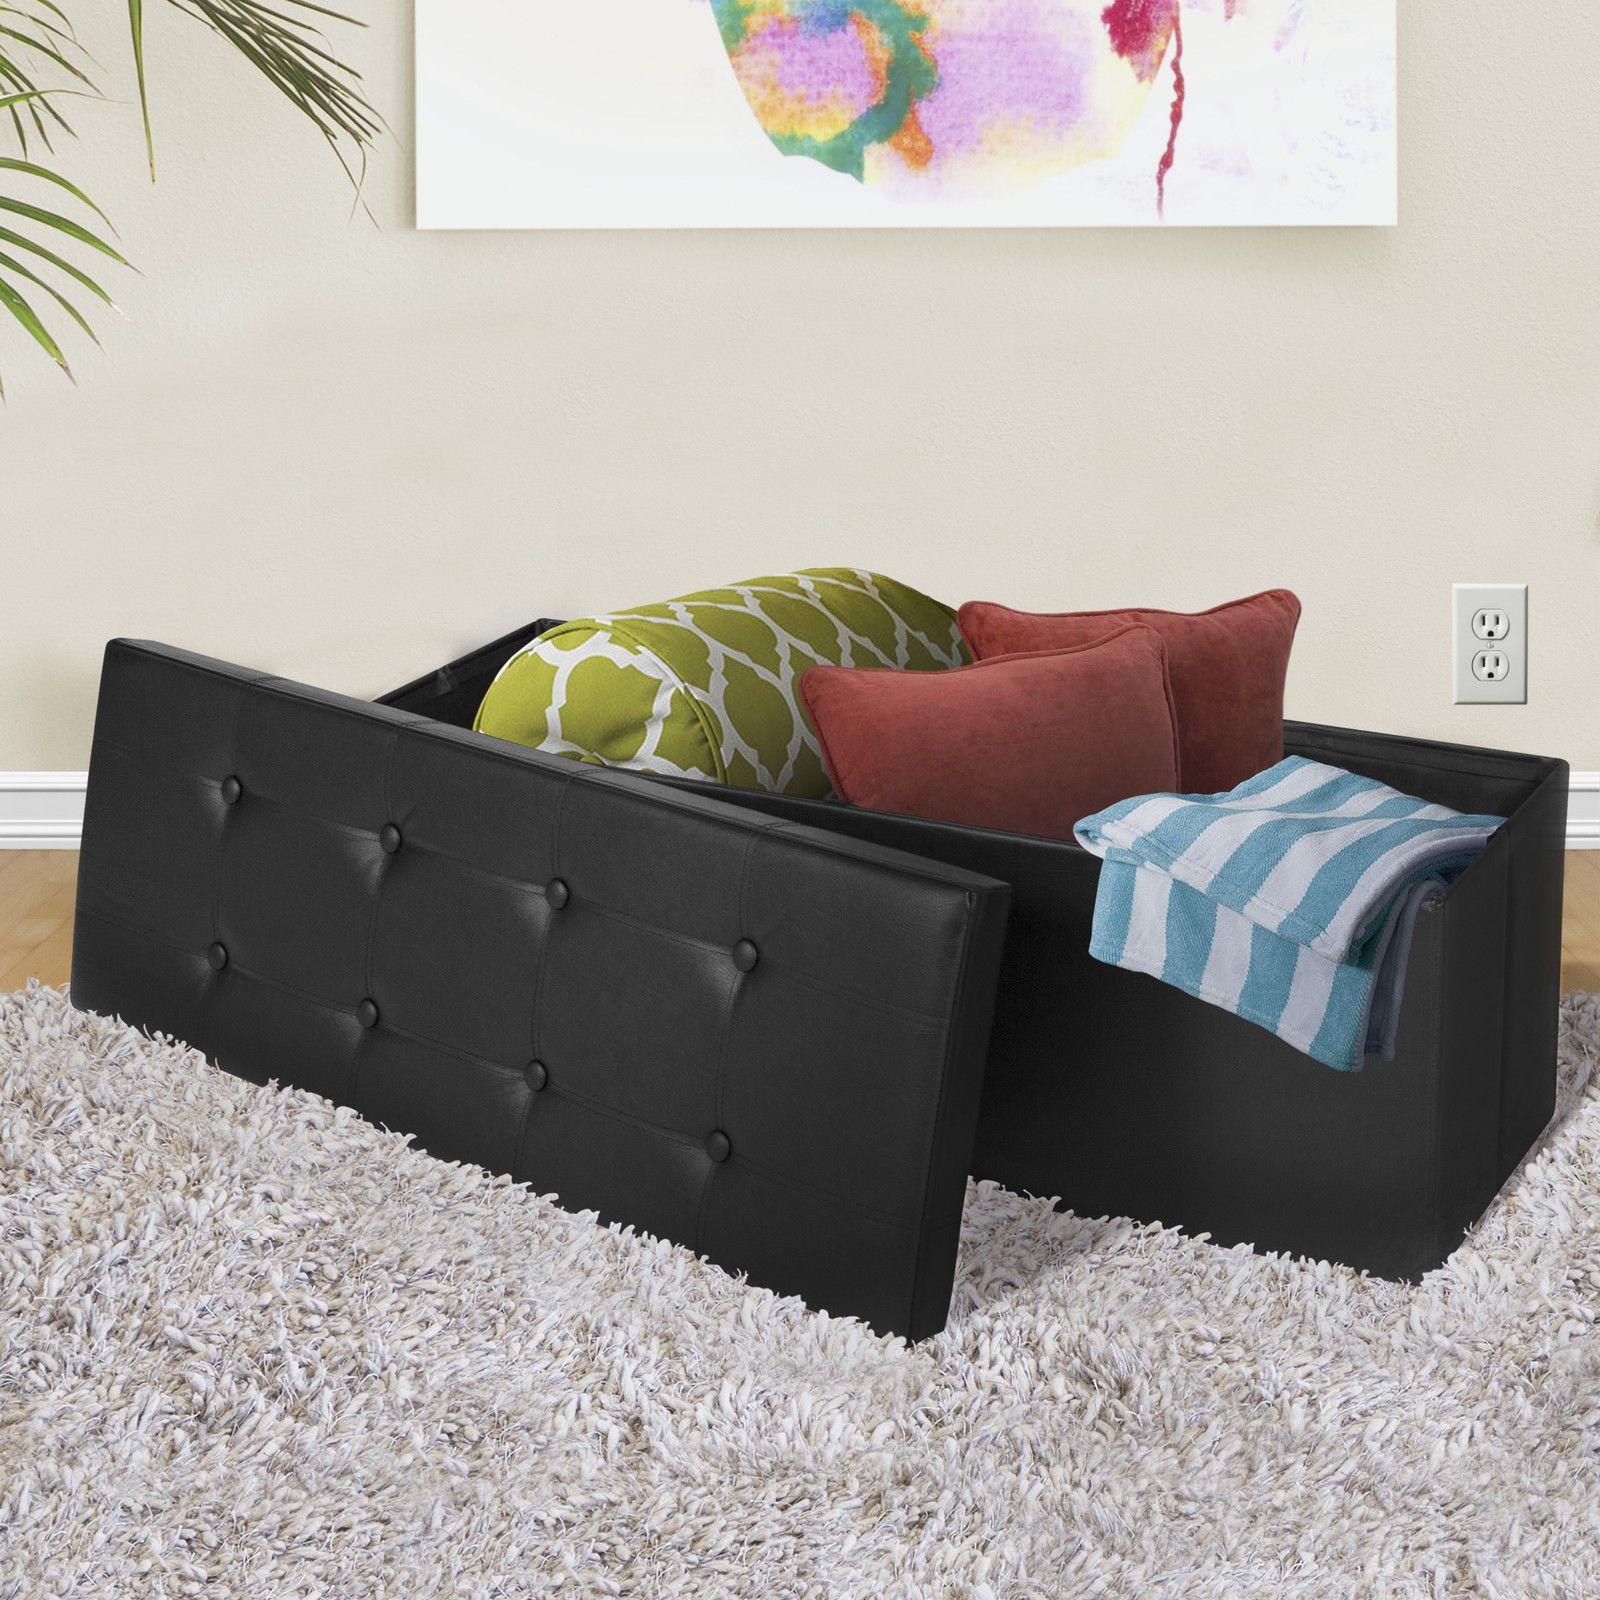 2019 Faux Leather Folding Storage Ottoman Large Black